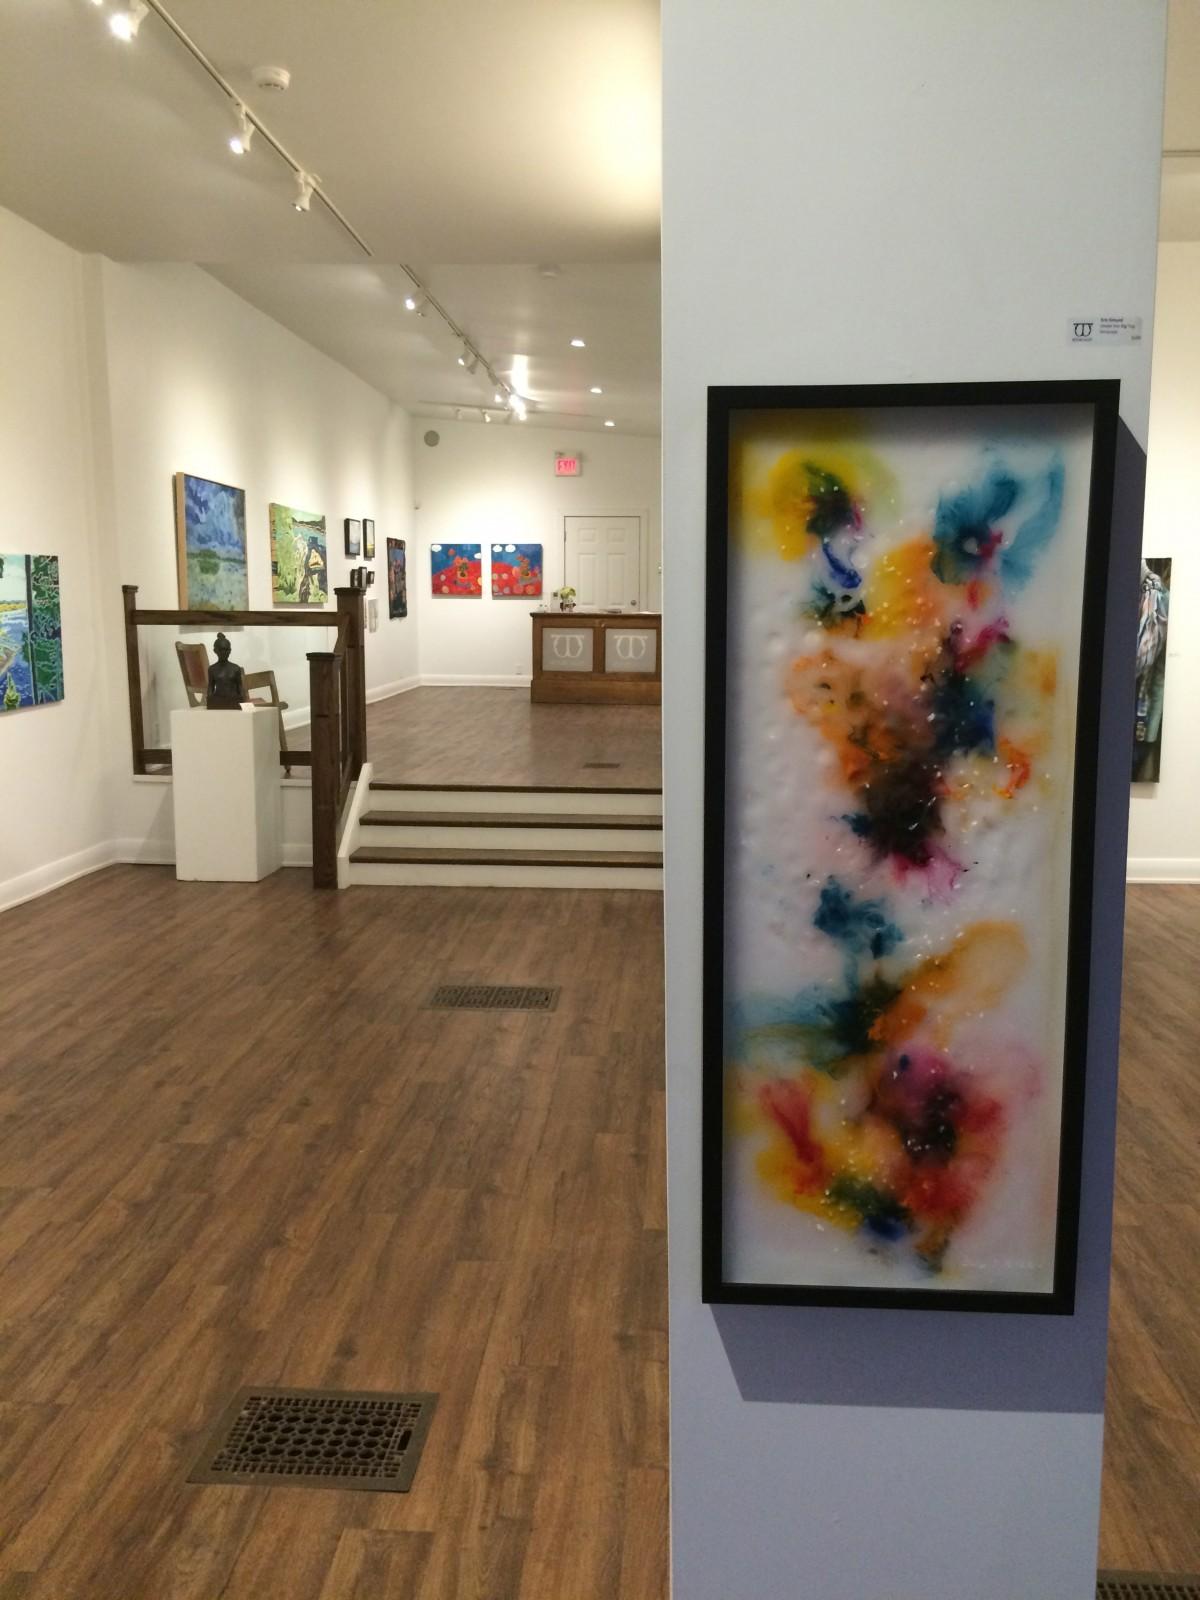 Creative local art showcased at Westland Gallery